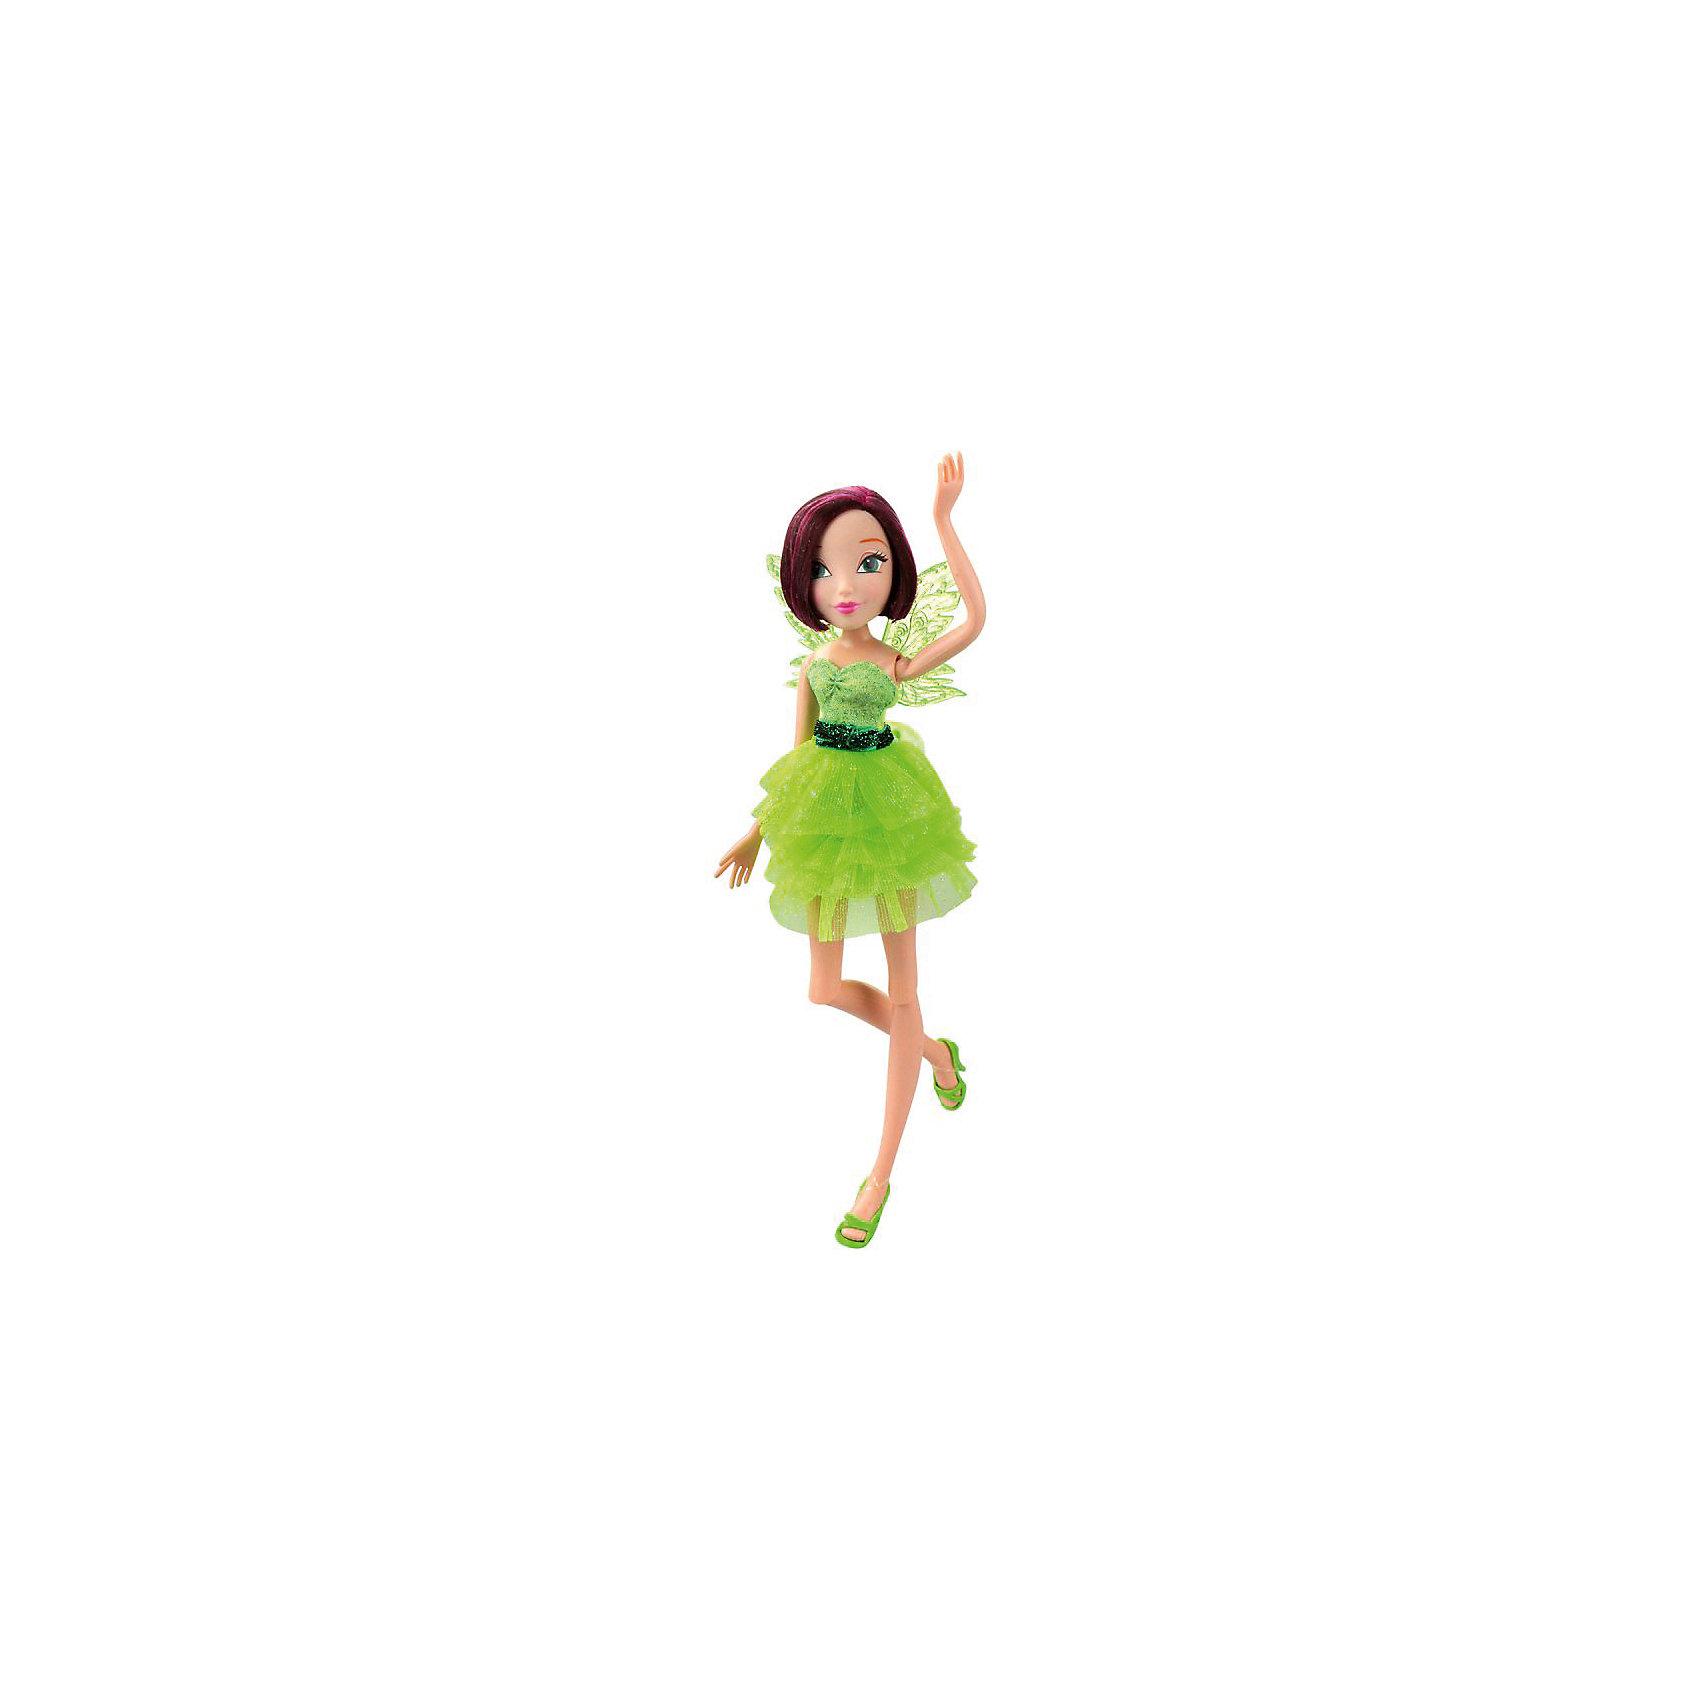 Кукла Winx Club Мода и магия-4 Техна, 31,5 смПопулярные игрушки<br><br><br>Ширина мм: 130<br>Глубина мм: 60<br>Высота мм: 315<br>Вес г: 225<br>Возраст от месяцев: 36<br>Возраст до месяцев: 120<br>Пол: Женский<br>Возраст: Детский<br>SKU: 7097667